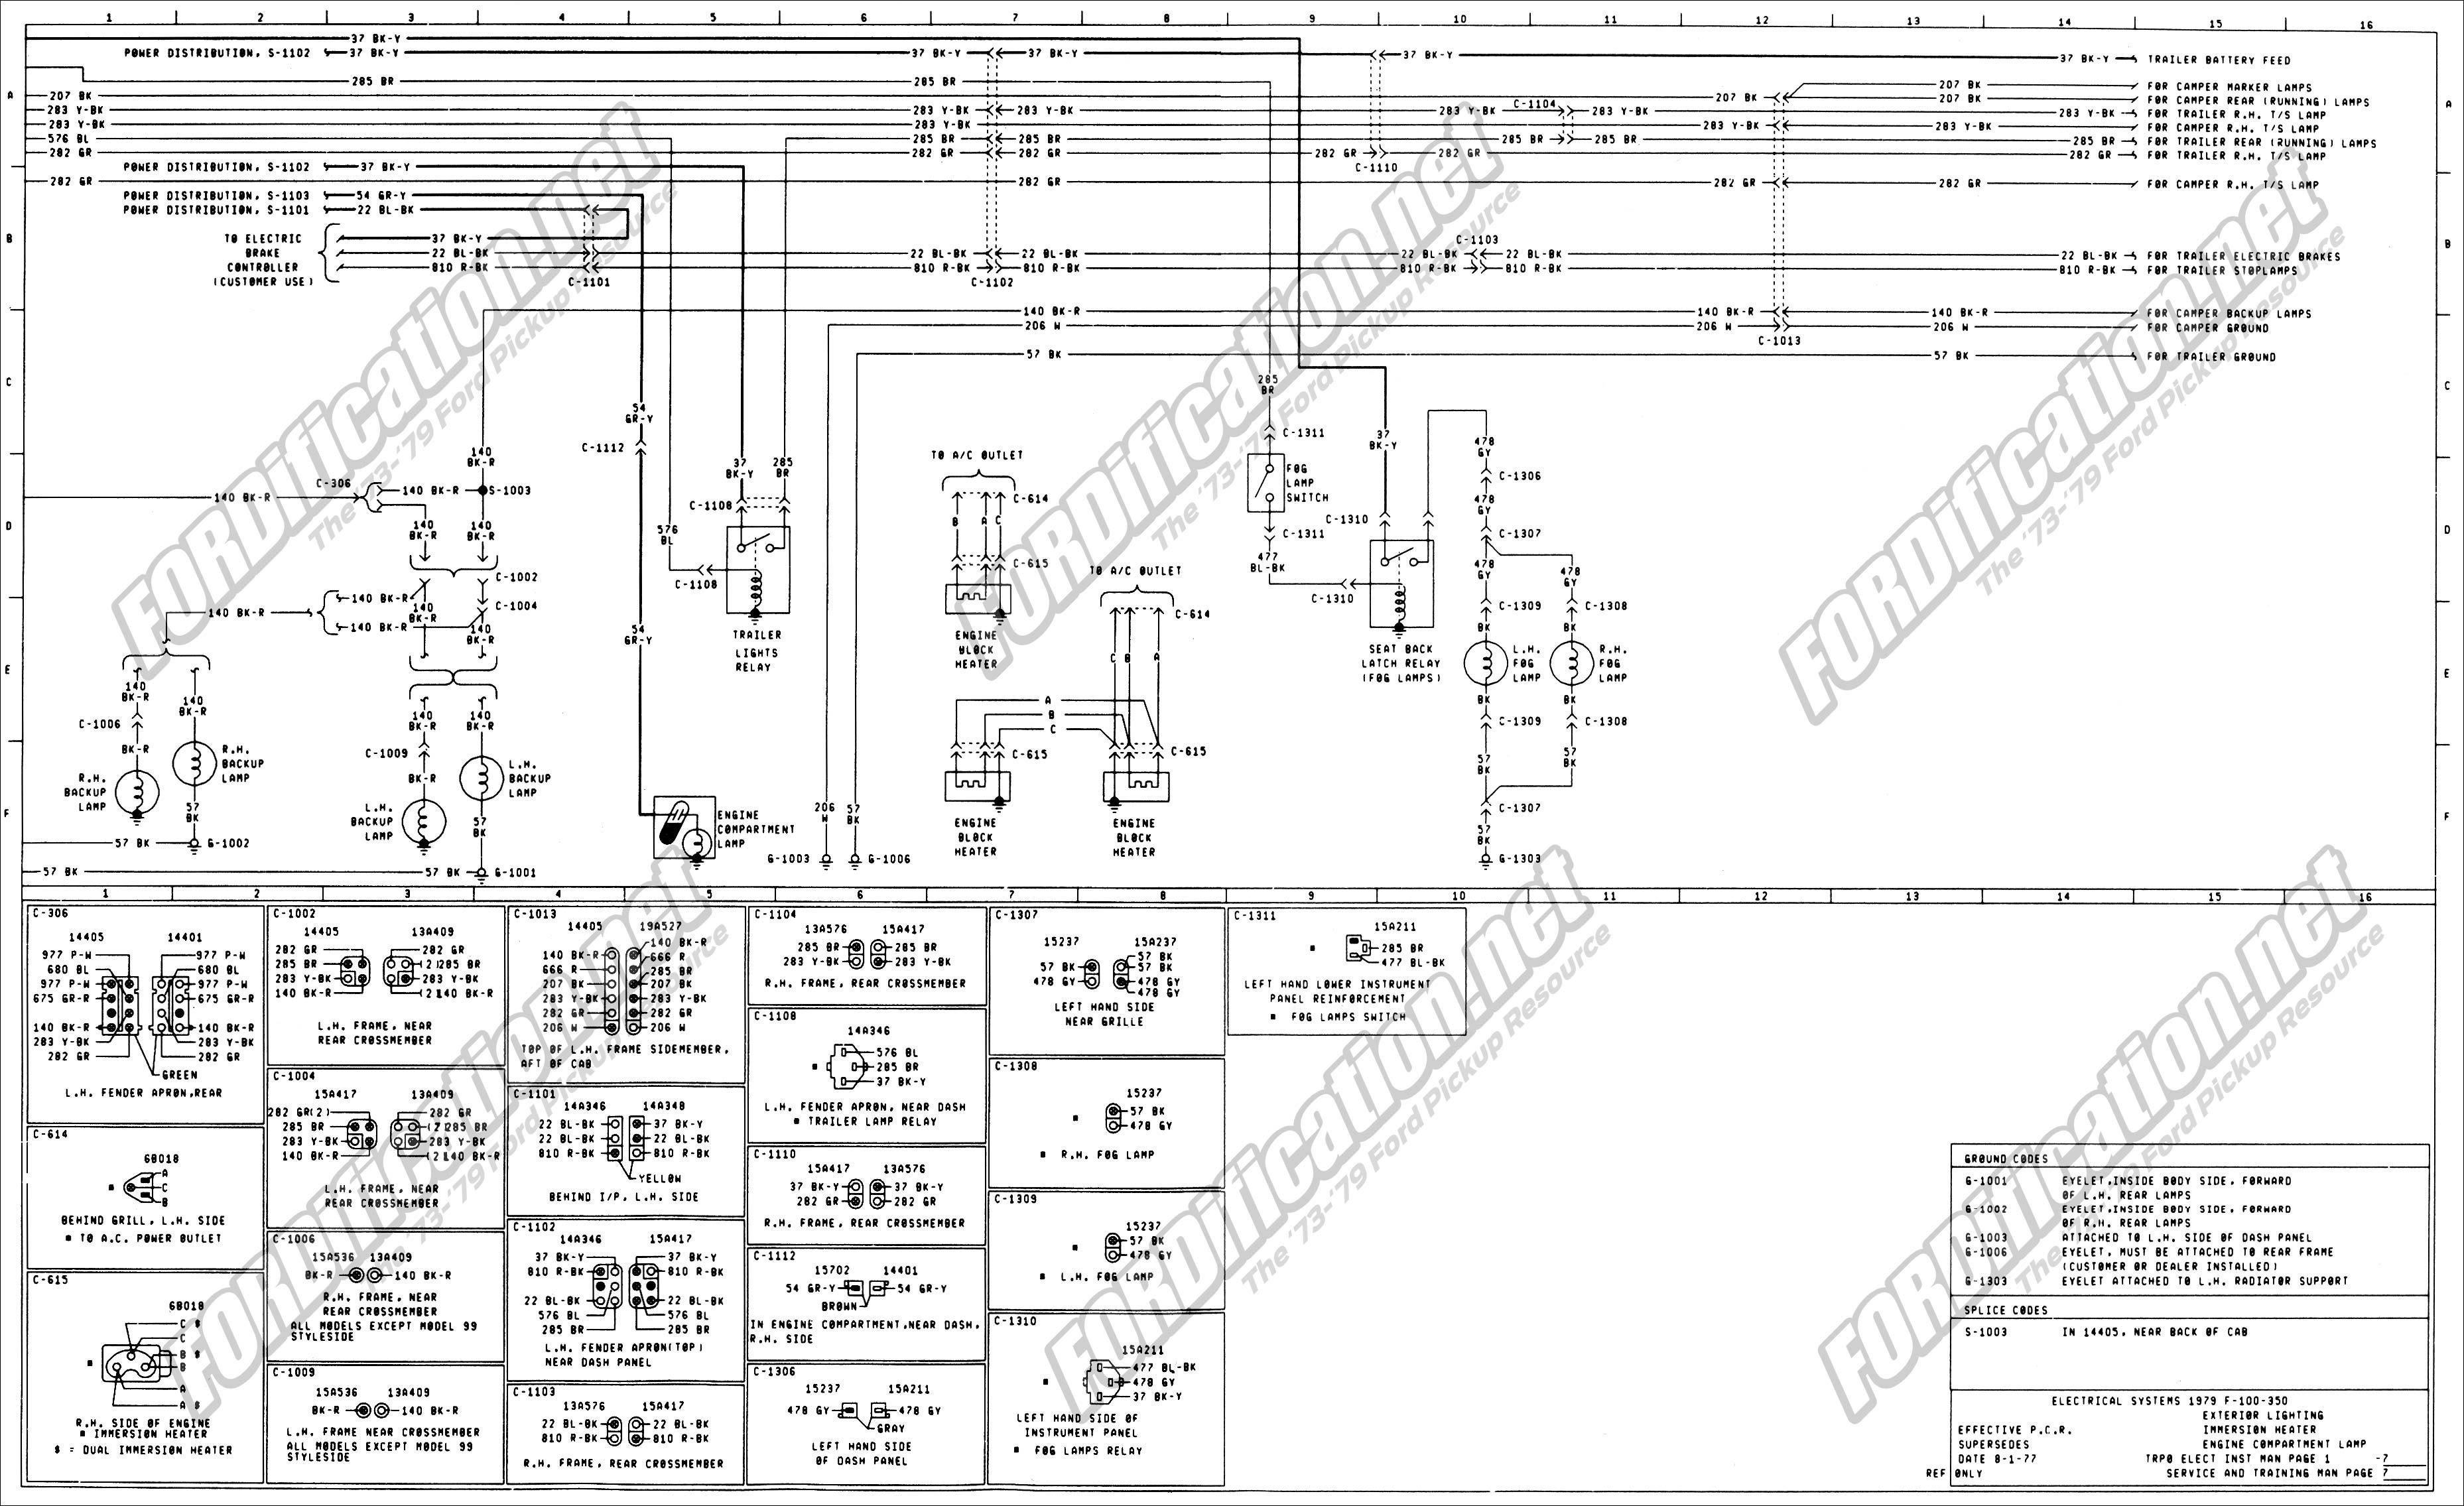 96 F250 Radio Wiring Diagram - Wiring Diagram Networks